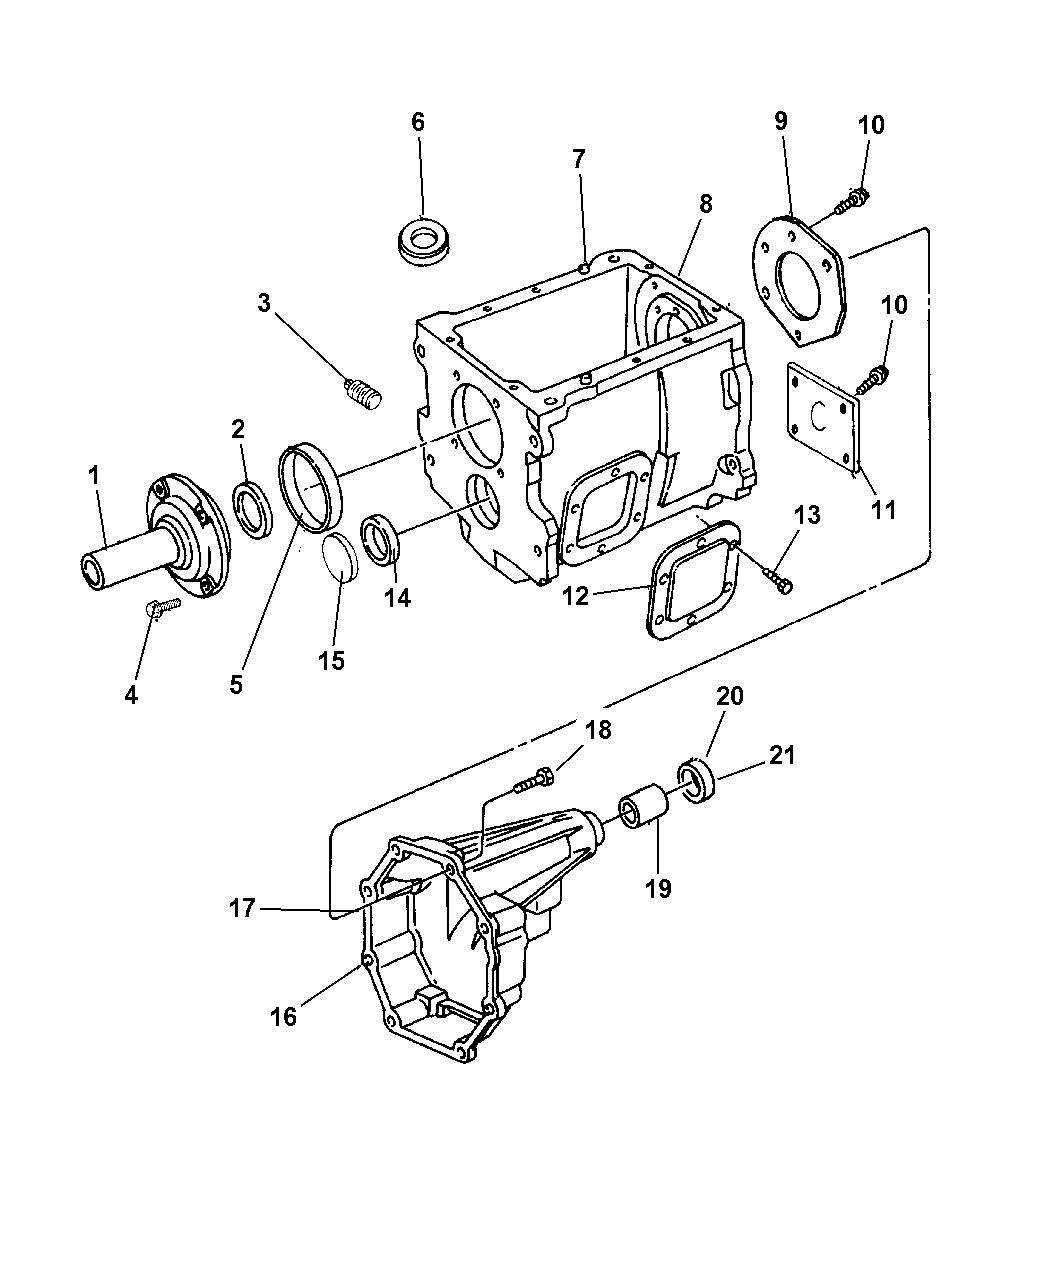 1997 Dodge Ram 3500 Case